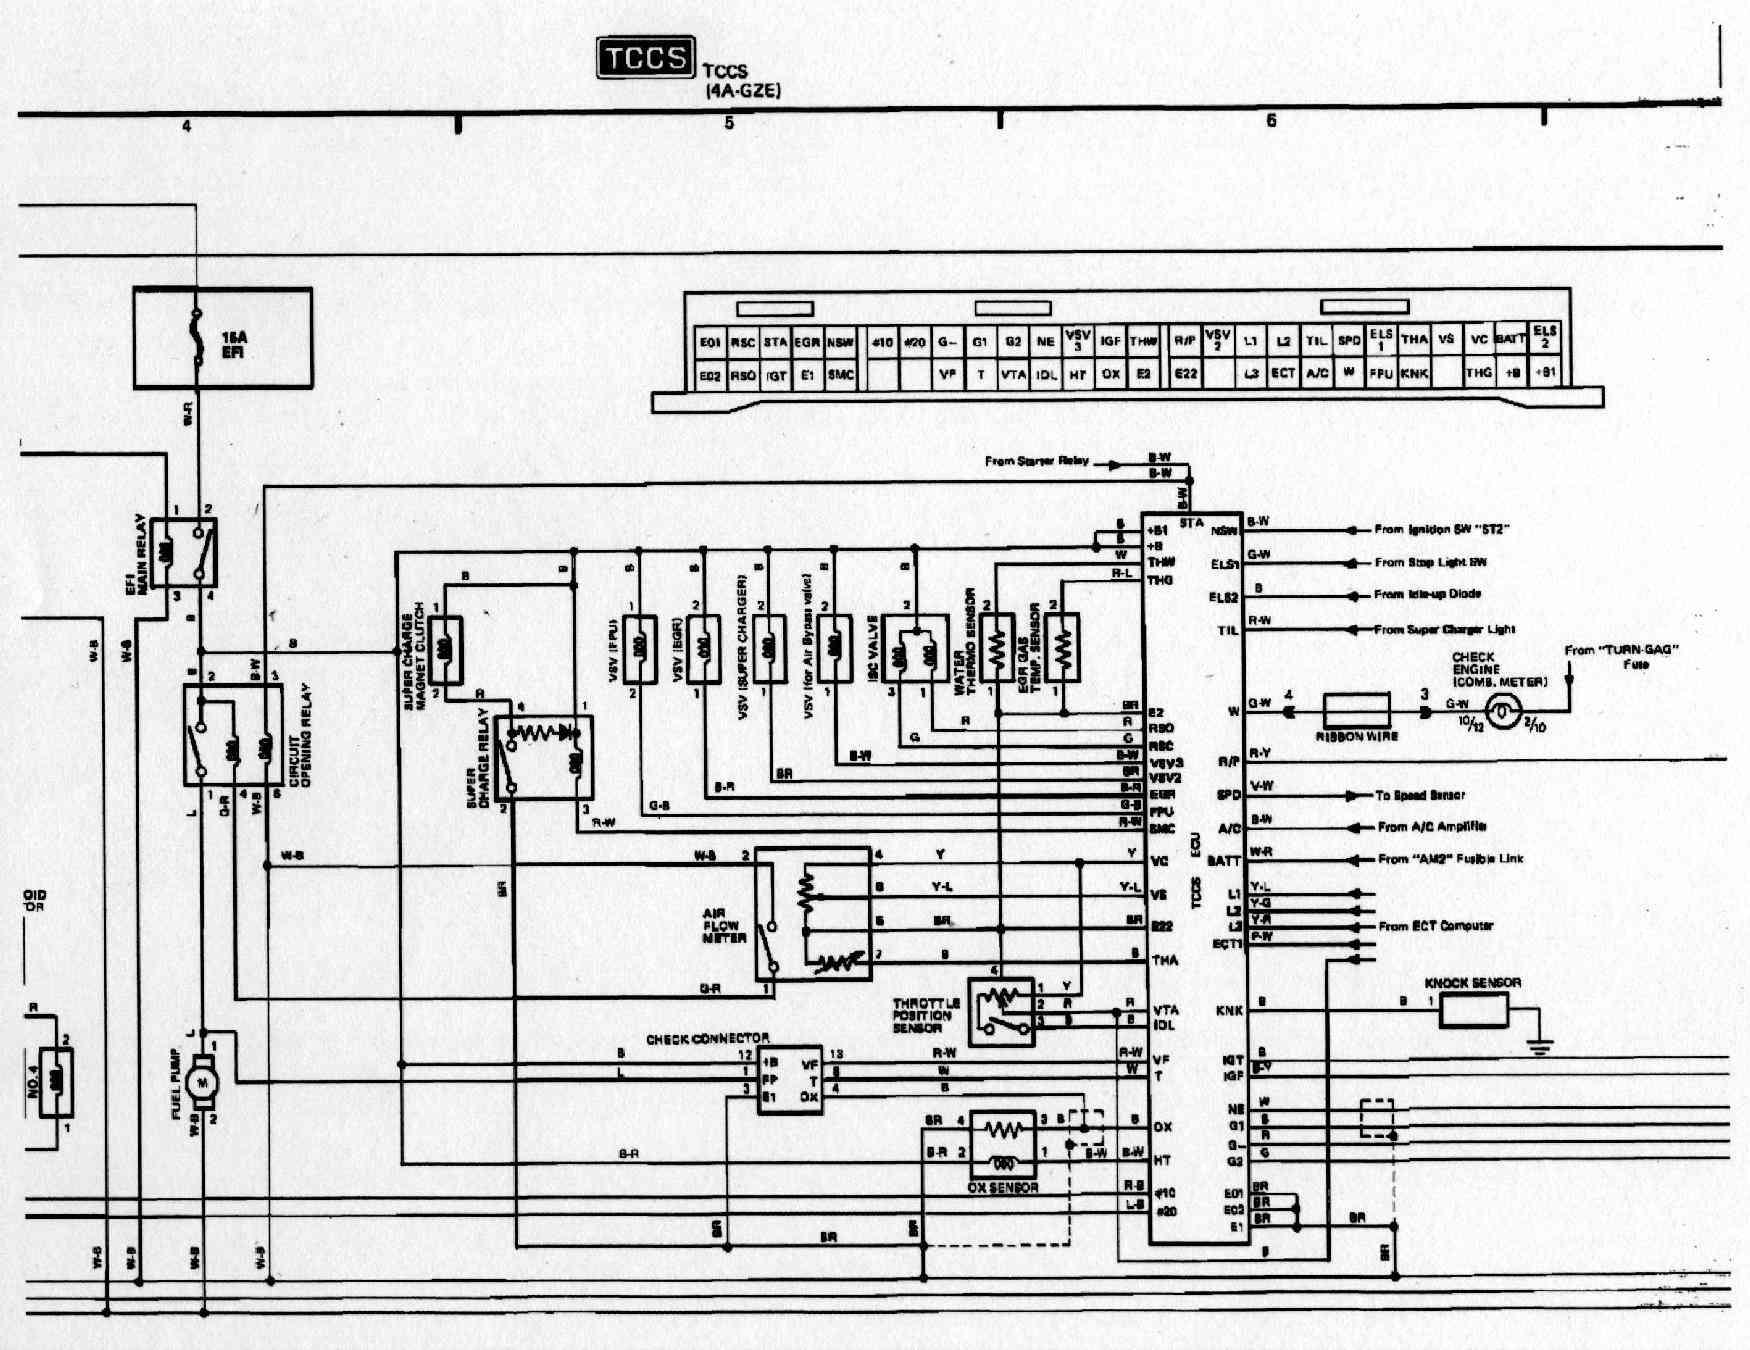 Scion Frs Radio Wiring Diagram 03 F450 Wiring Diagram Breaker Box Fuses